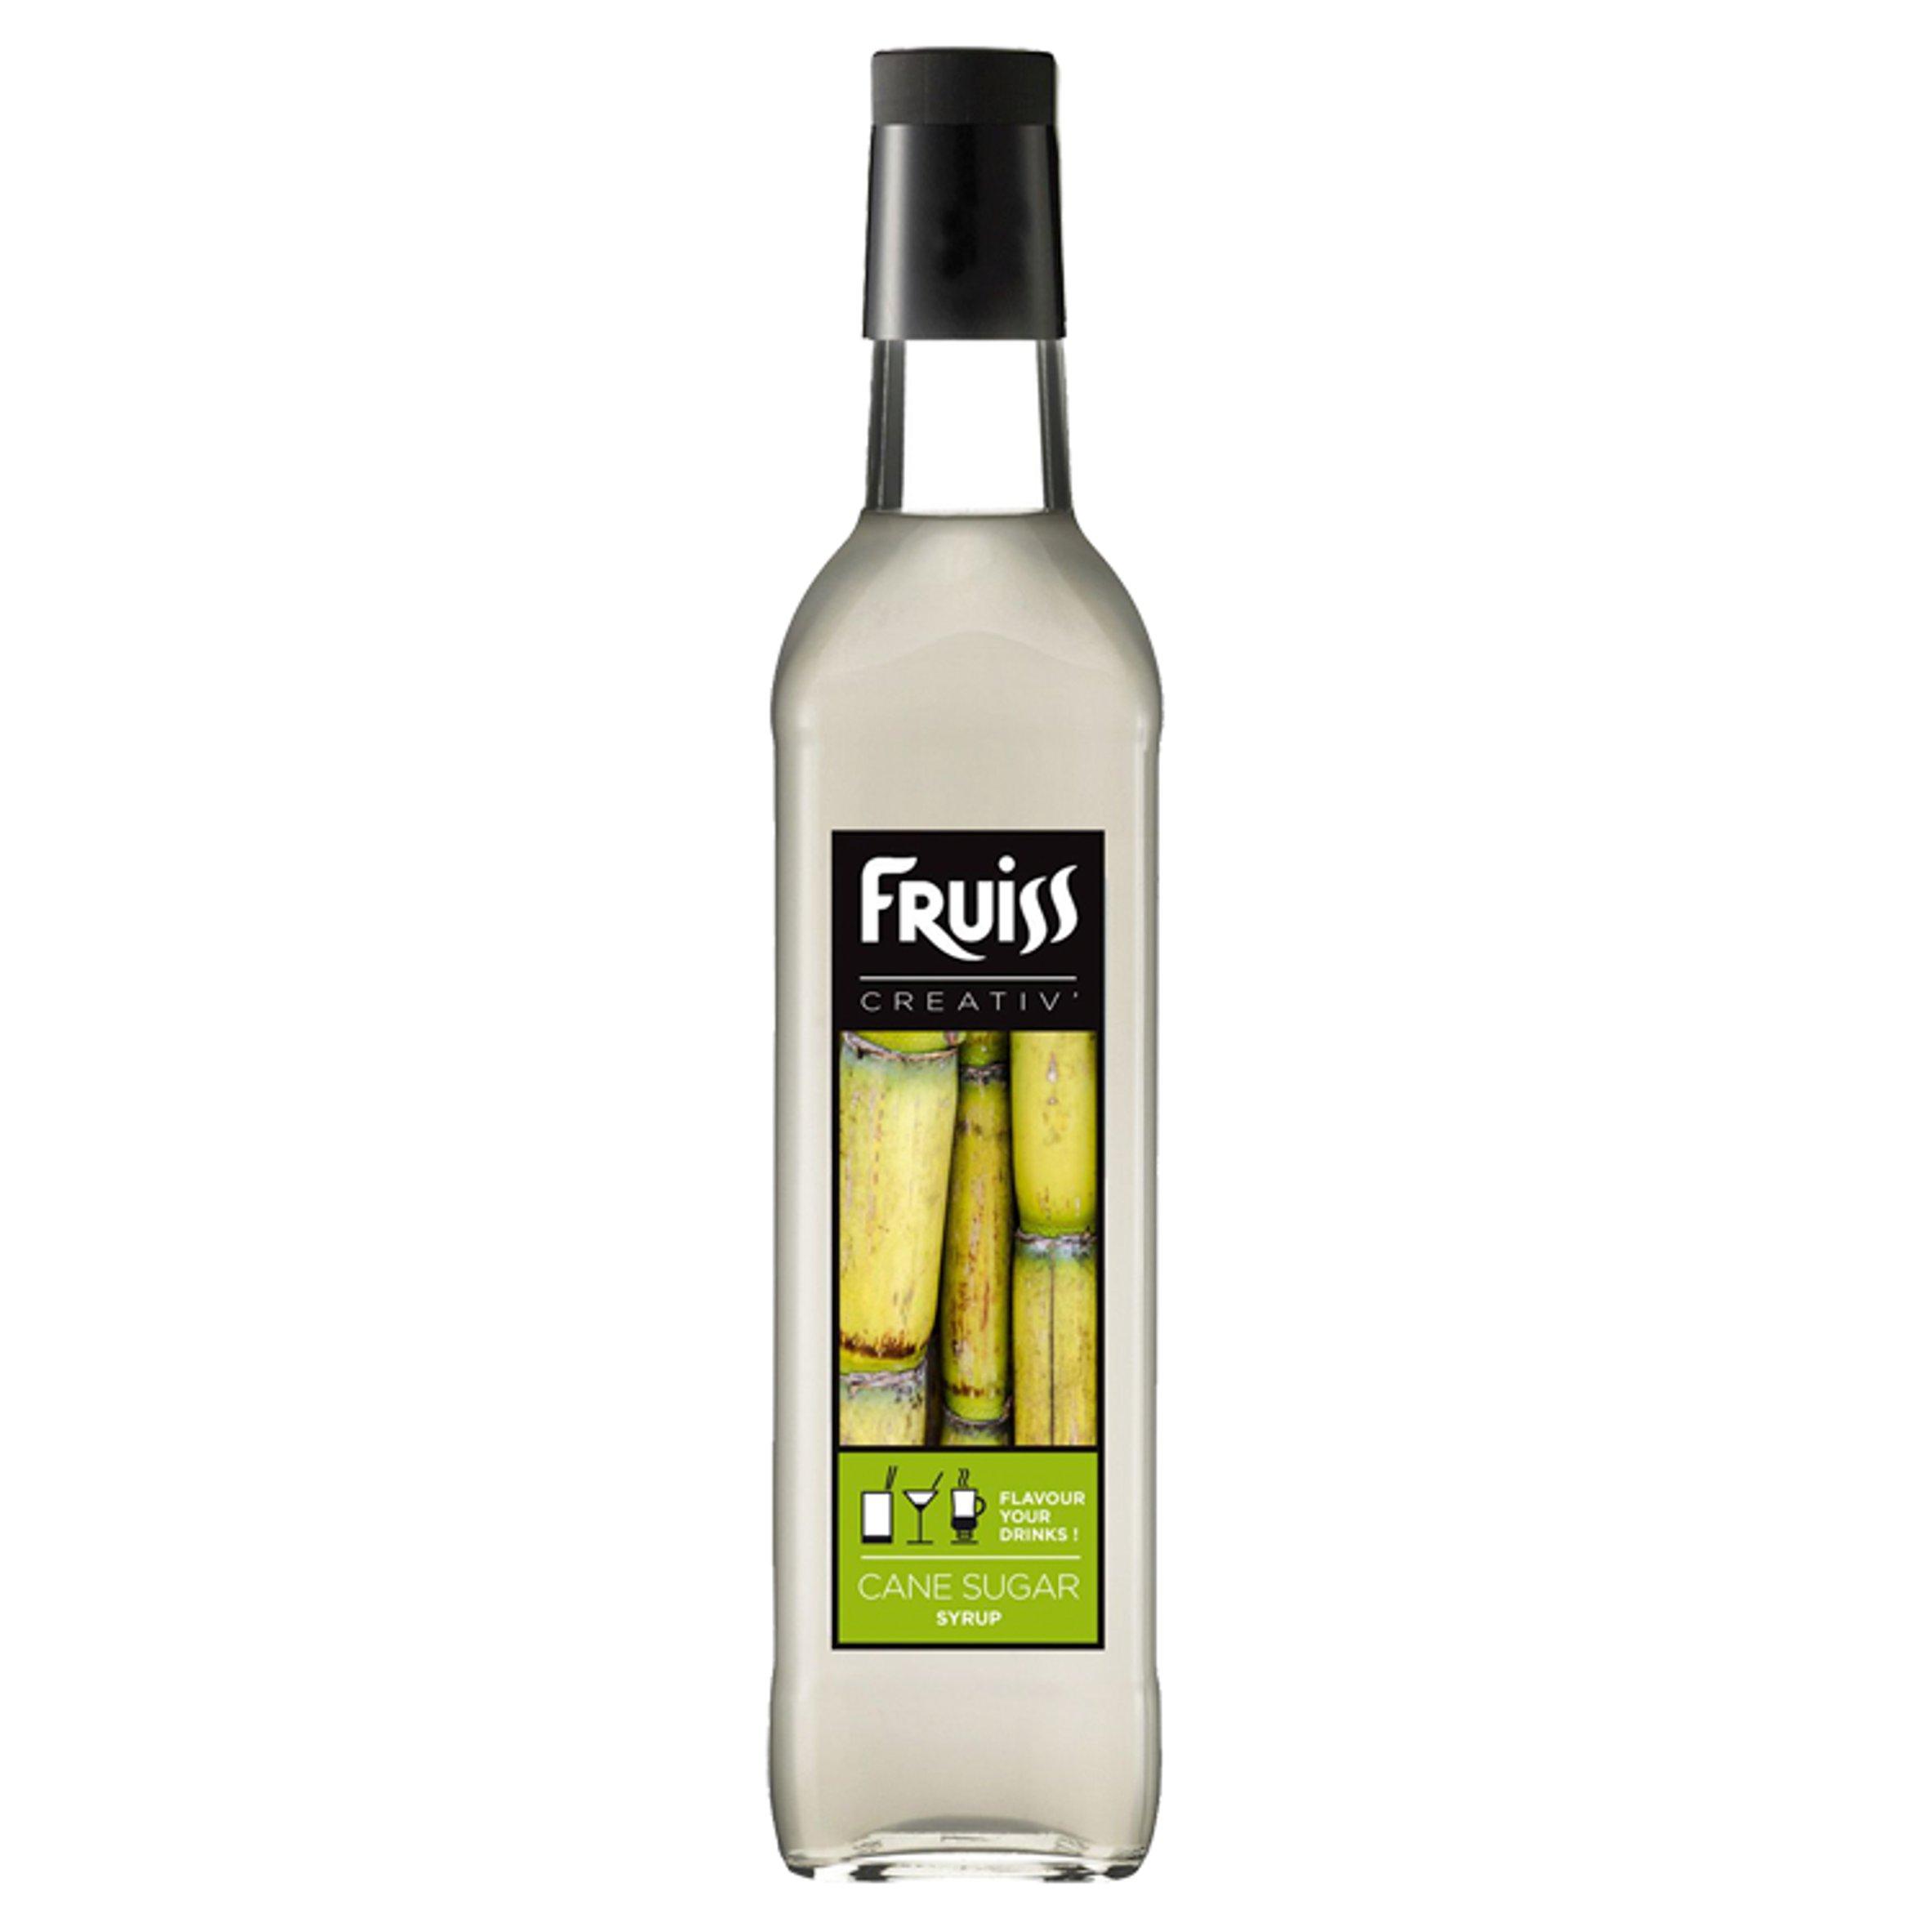 Fruiss Creative Pure Cane Sugar Syrup 70Cl